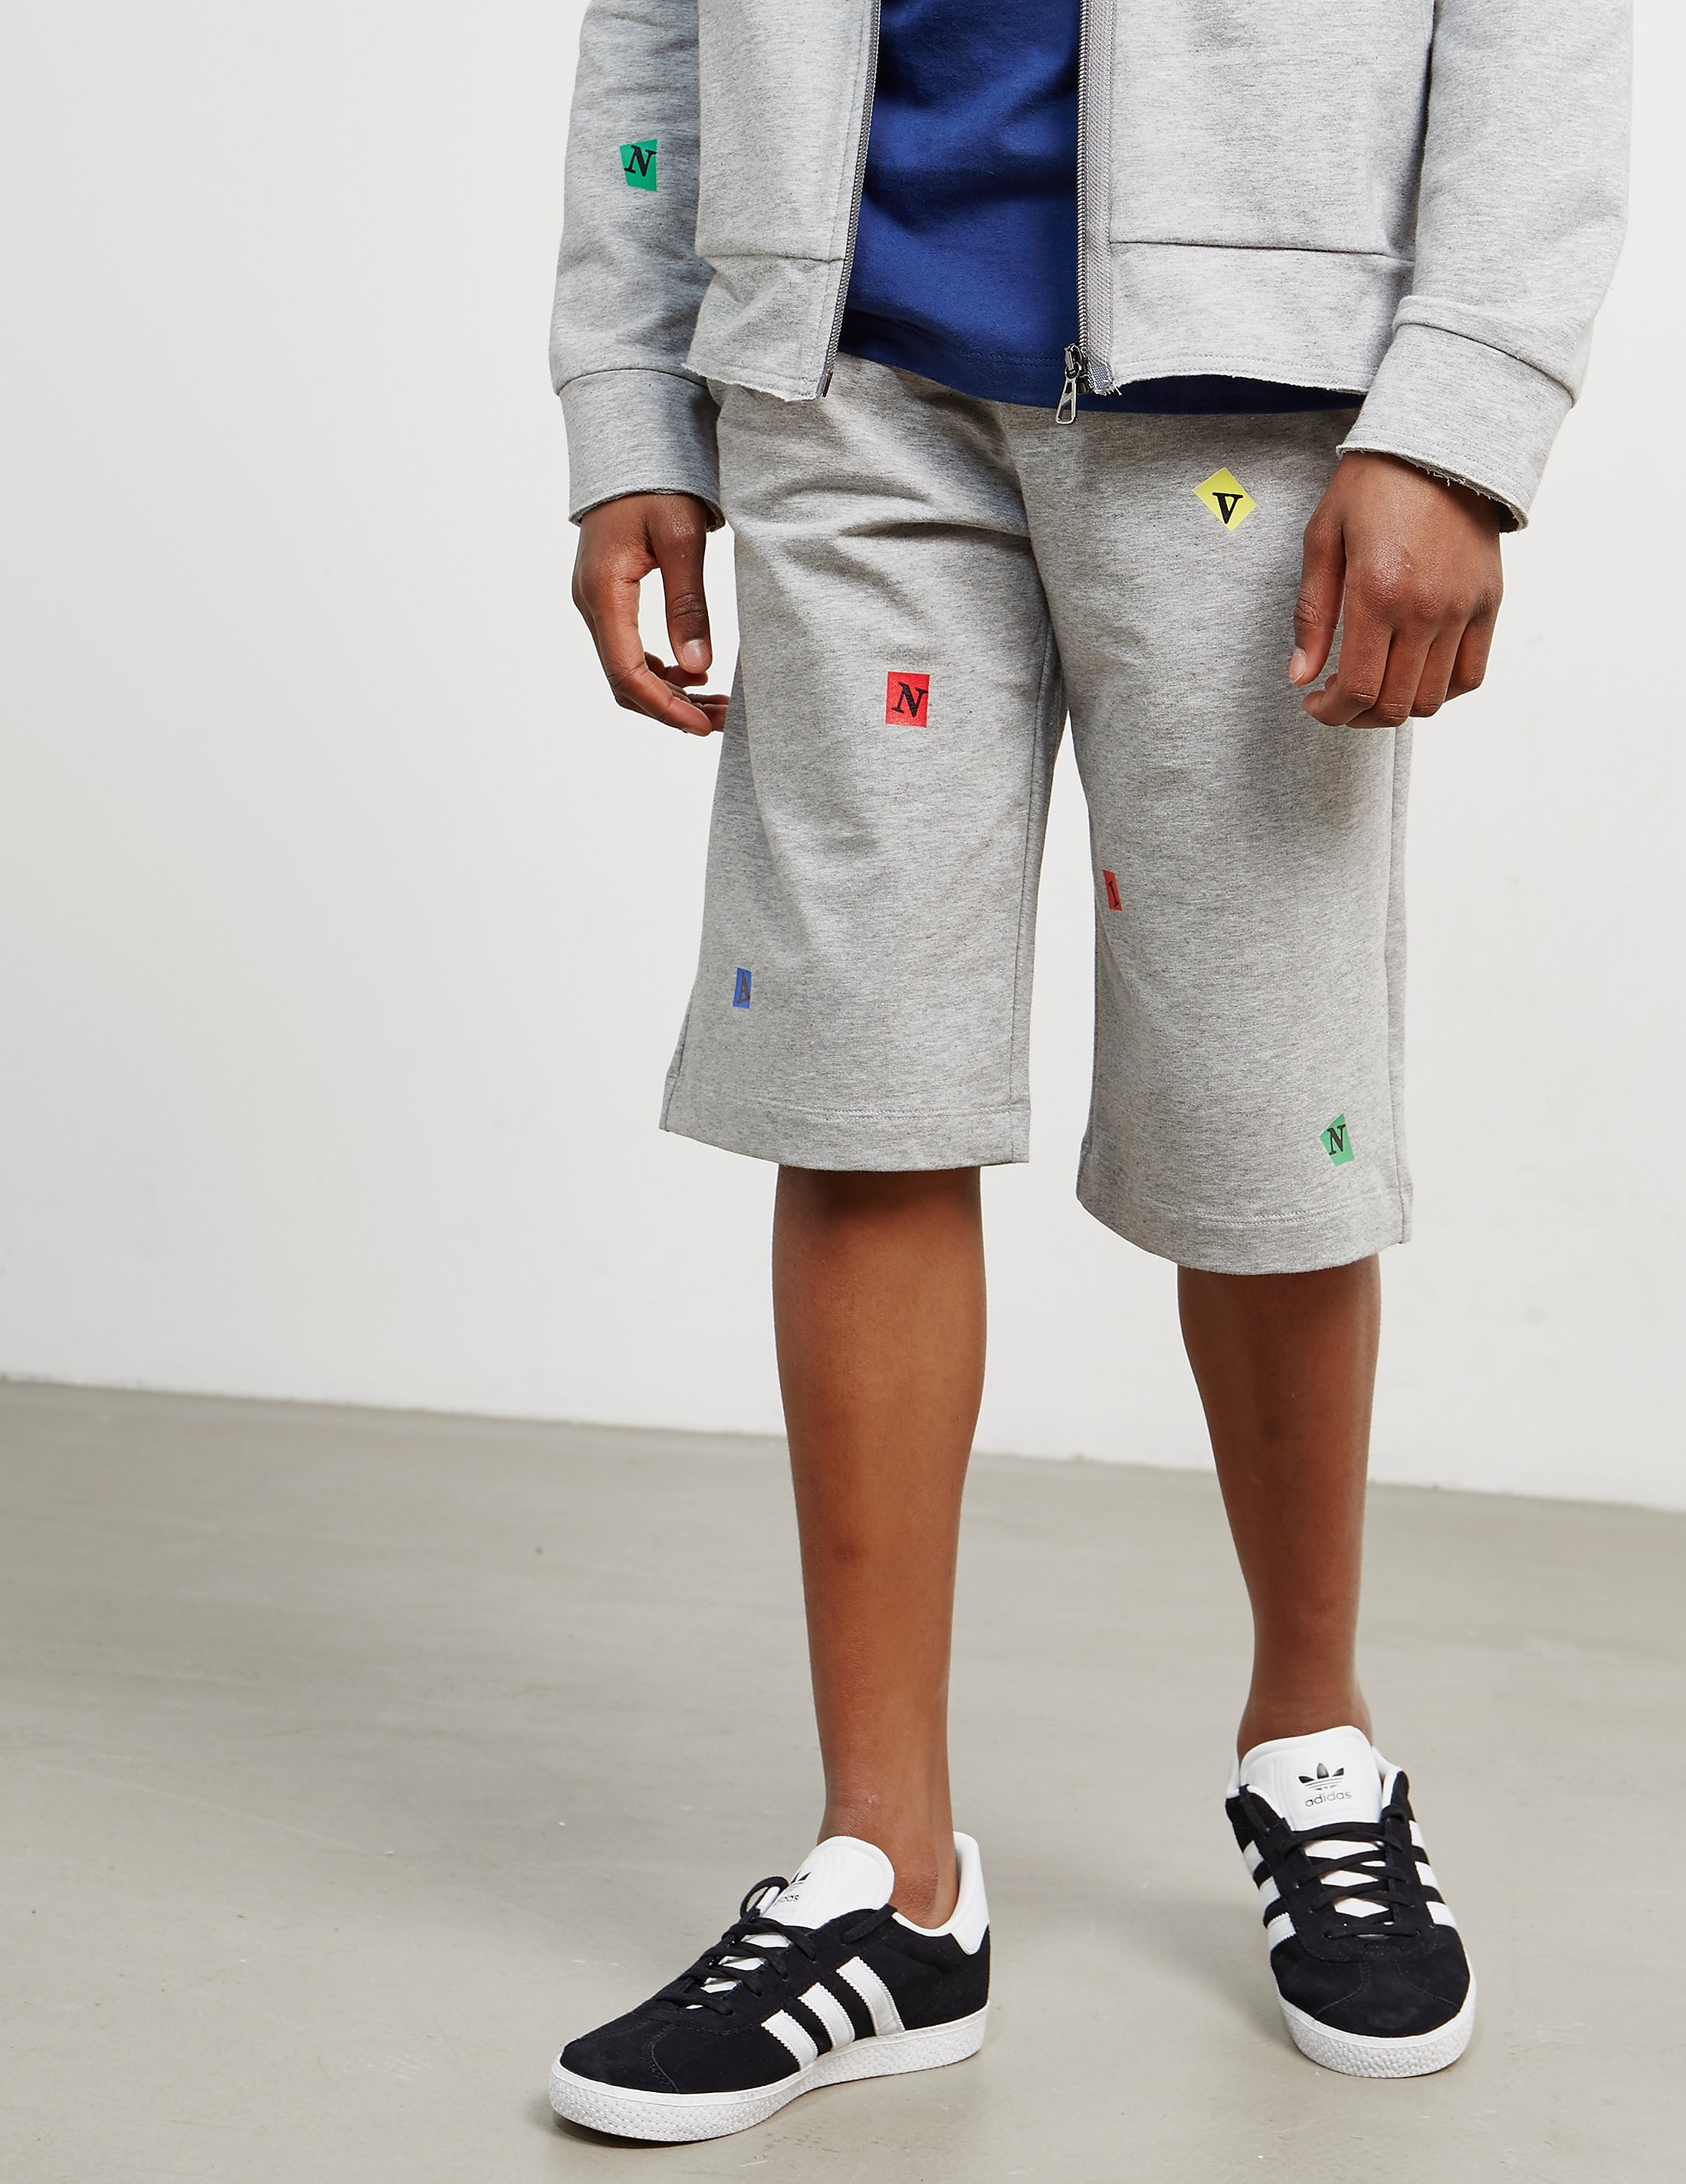 Lanvin Printed Logo Shorts